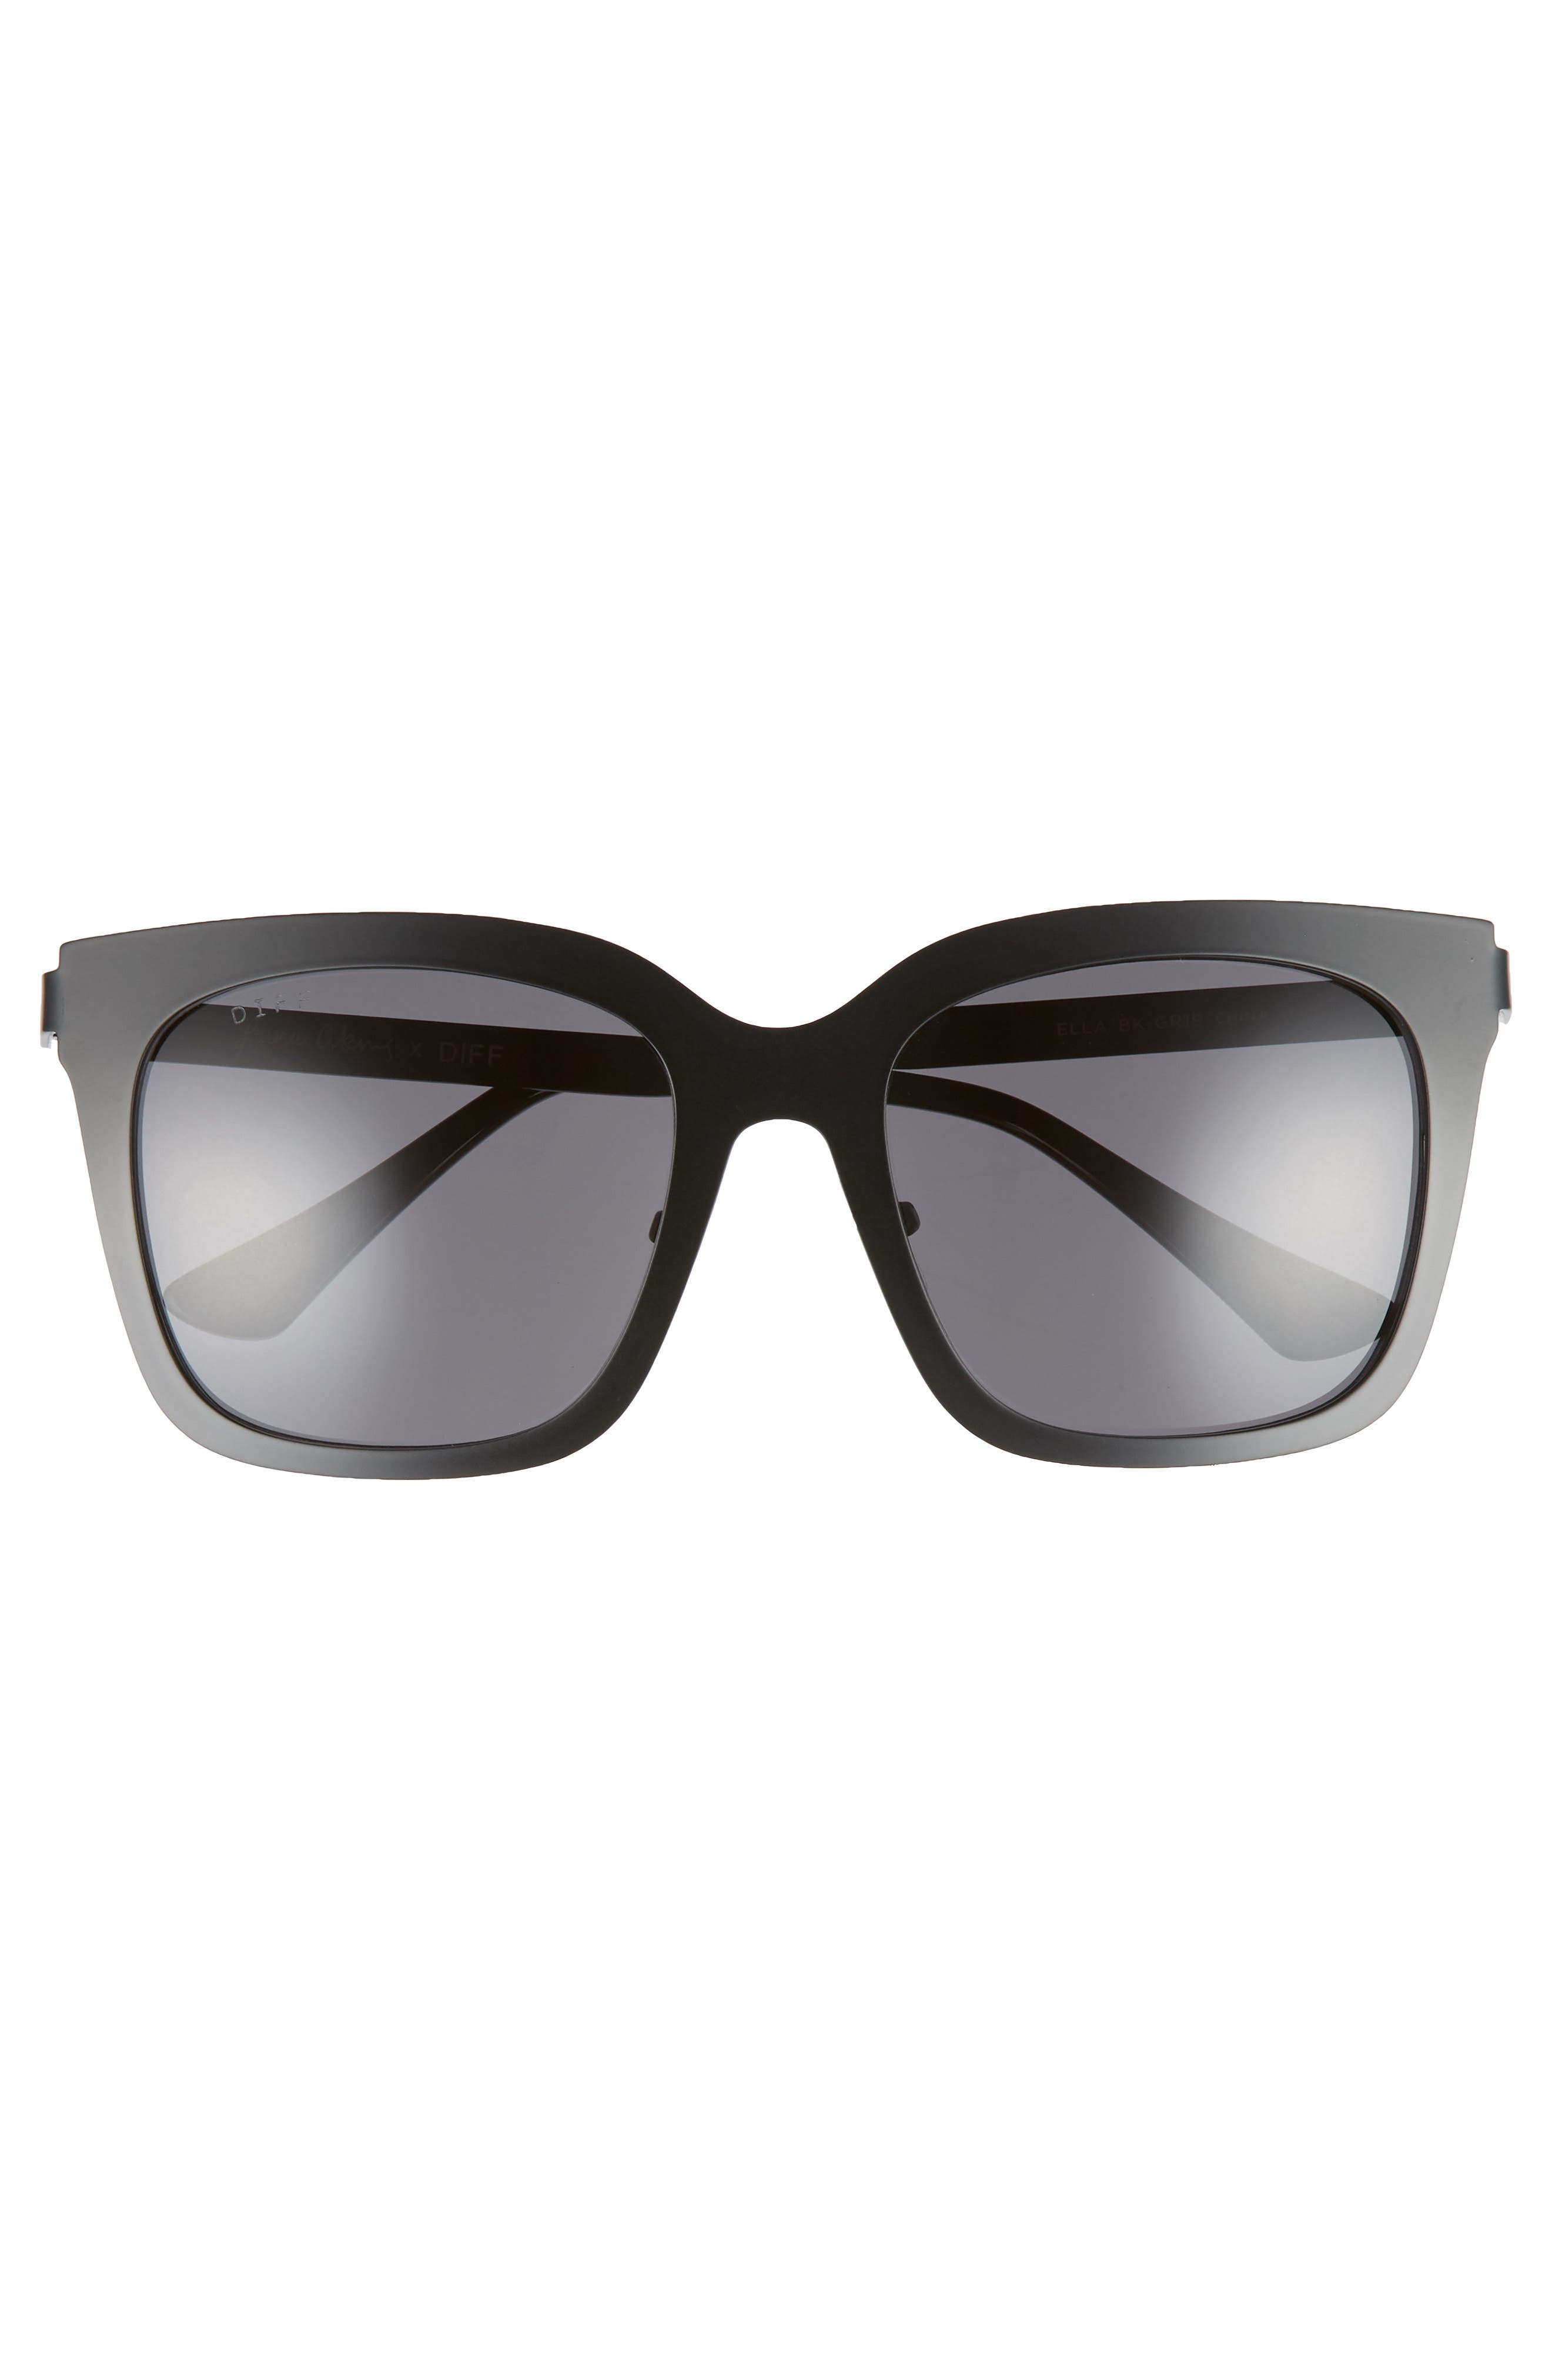 x Lauren Akins Ella 53mm Cat Eye Sunglasses,                             Alternate thumbnail 3, color,                             BLACK/ GREY